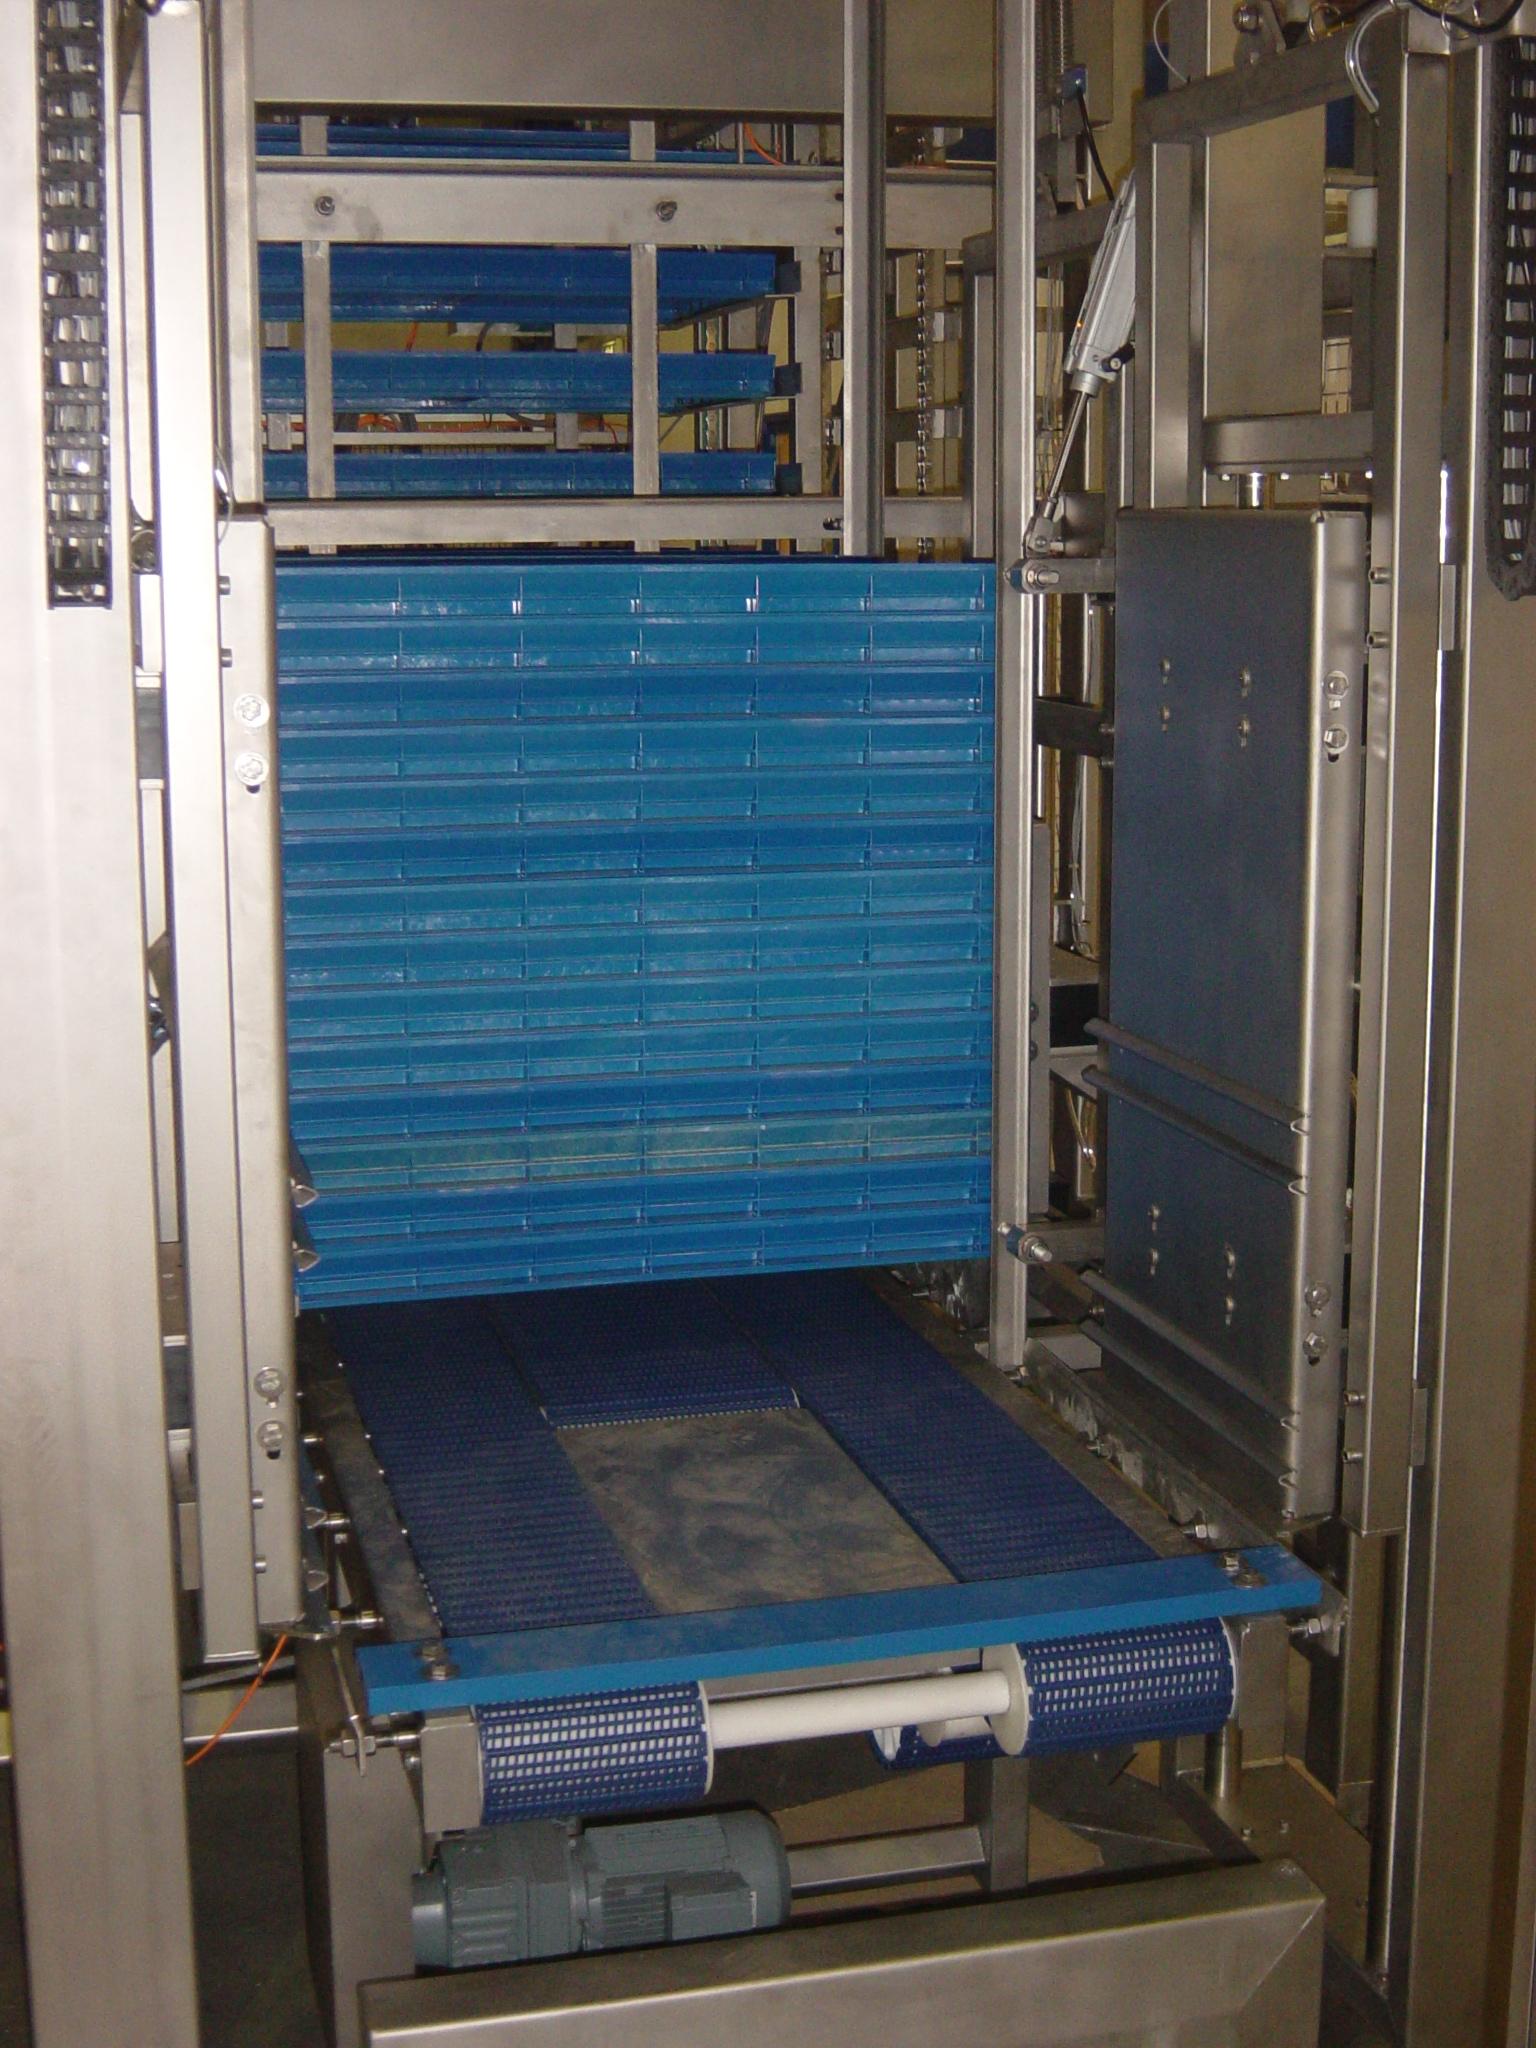 2005-1104 (Unit B Dollybe-ont-lader Kratten) 11